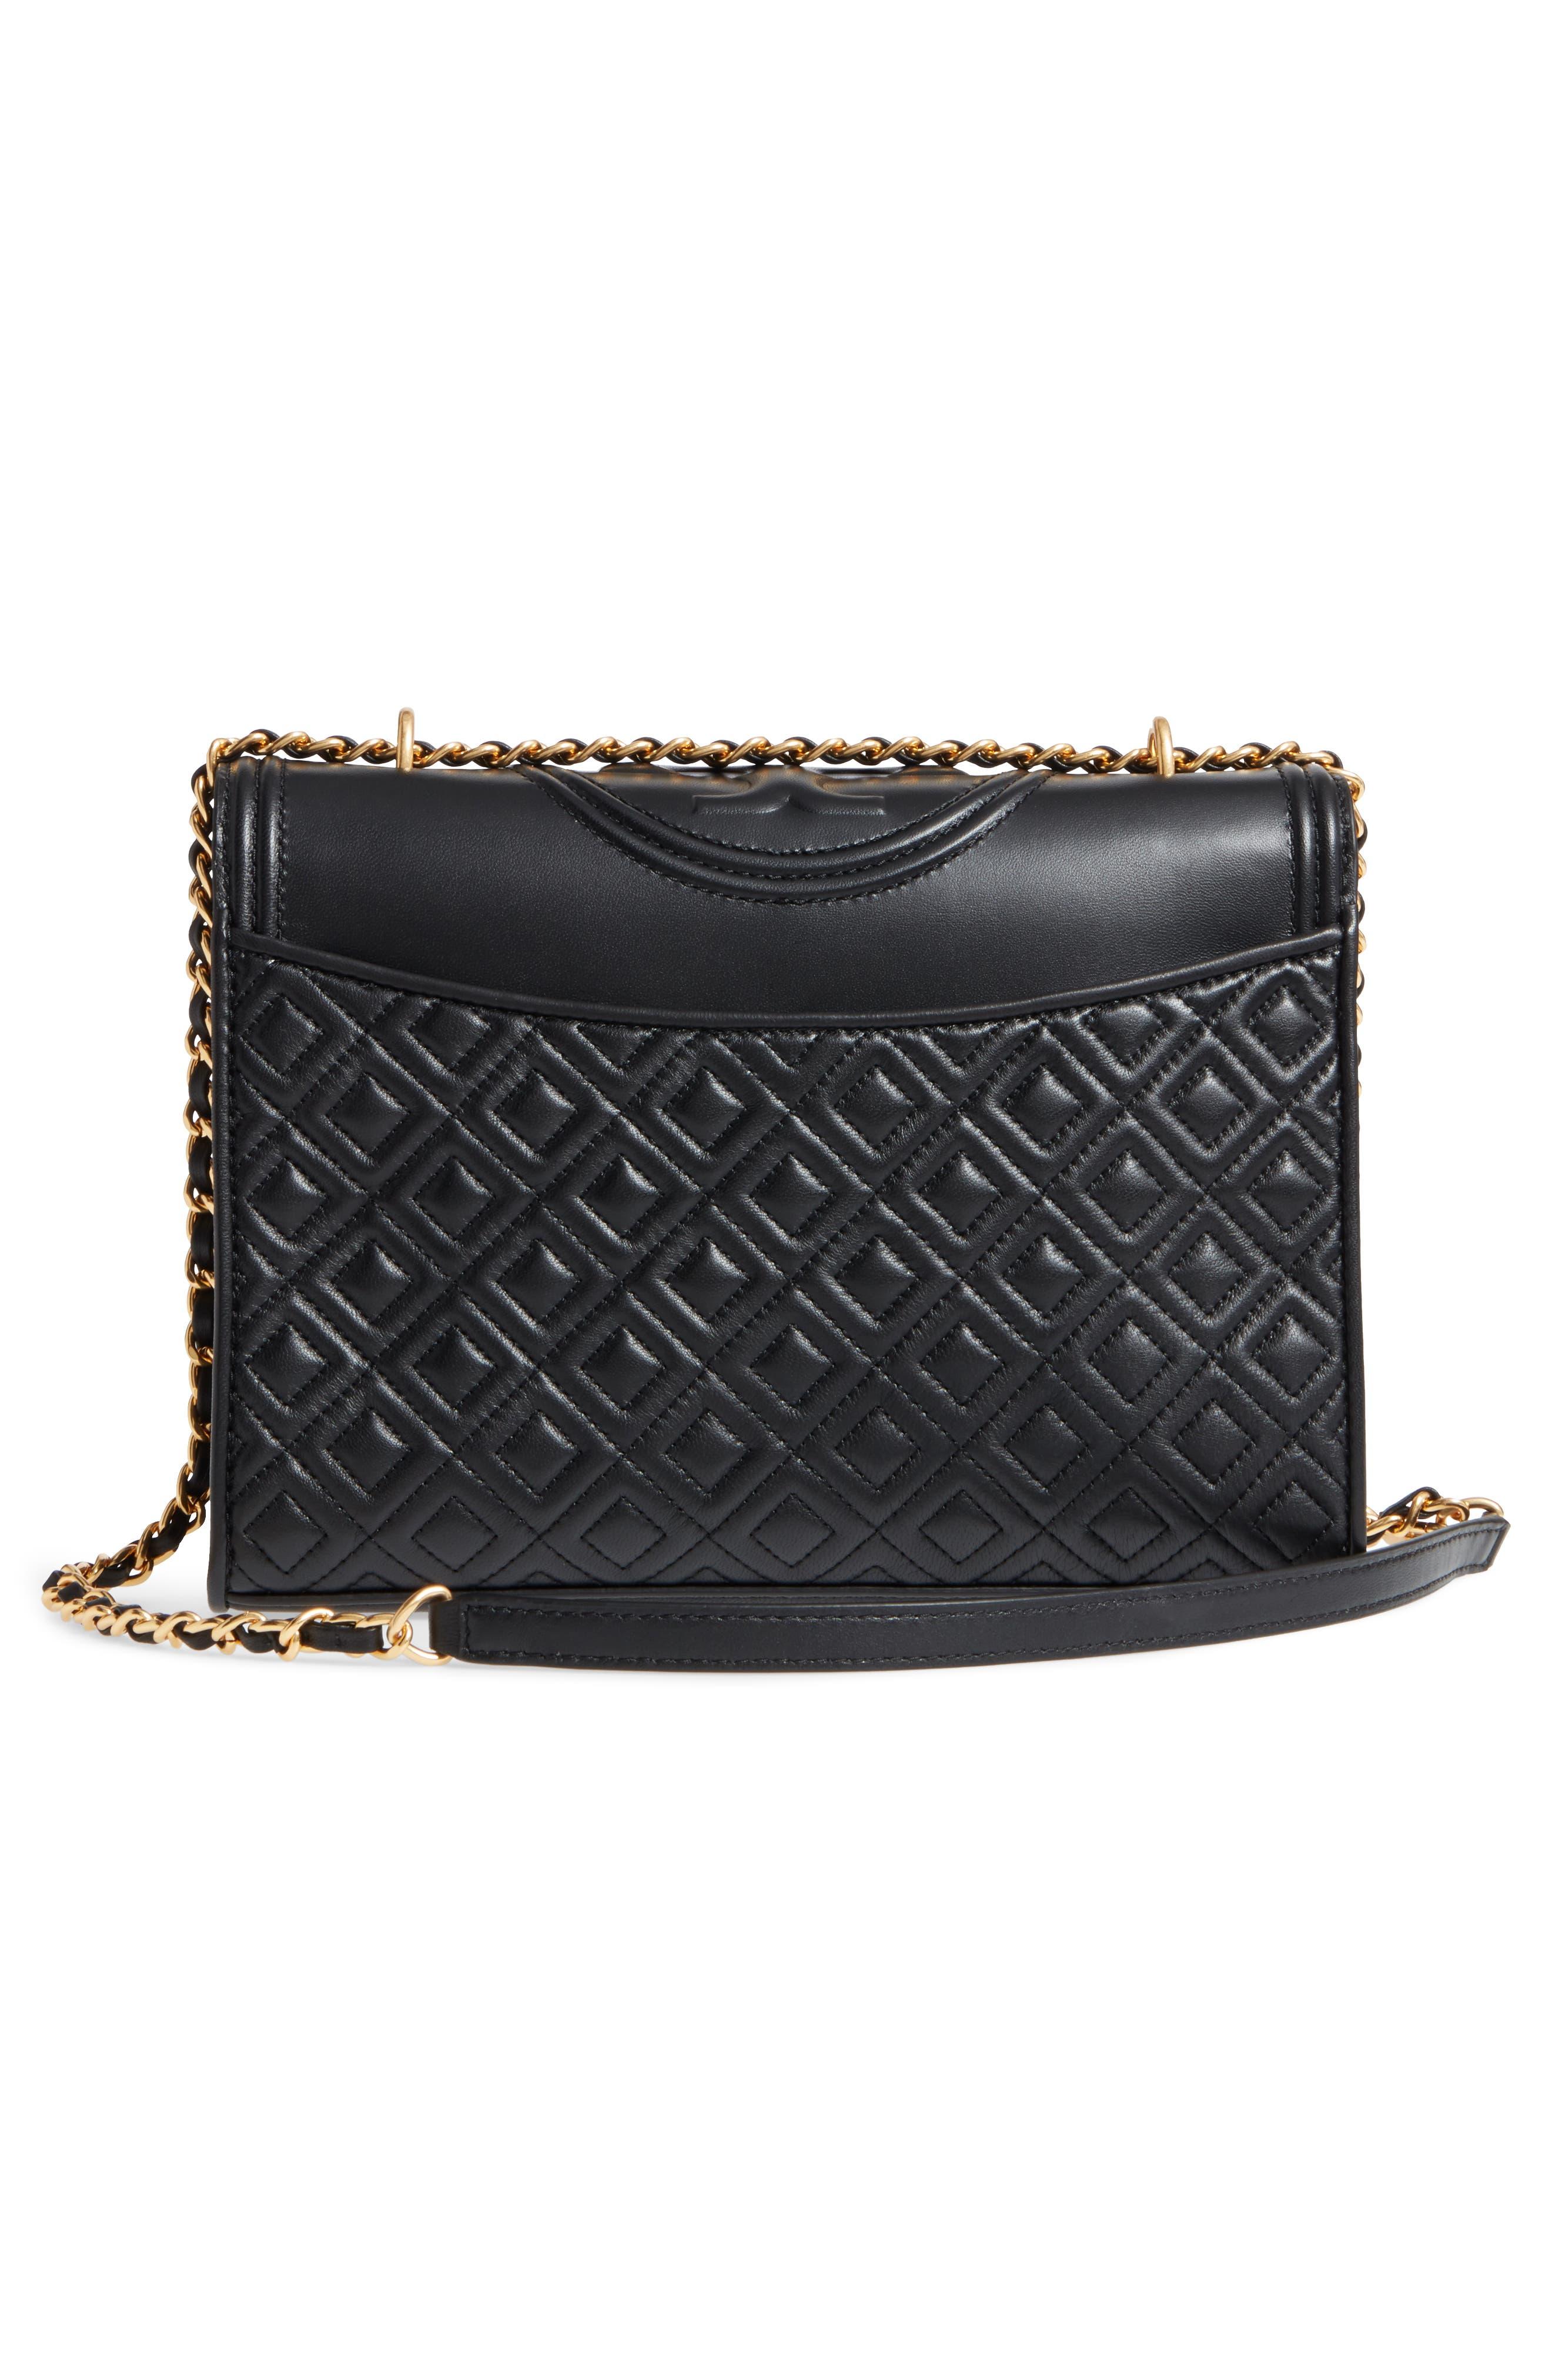 TORY BURCH, Fleming Leather Convertible Shoulder Bag, Alternate thumbnail 4, color, BLACK